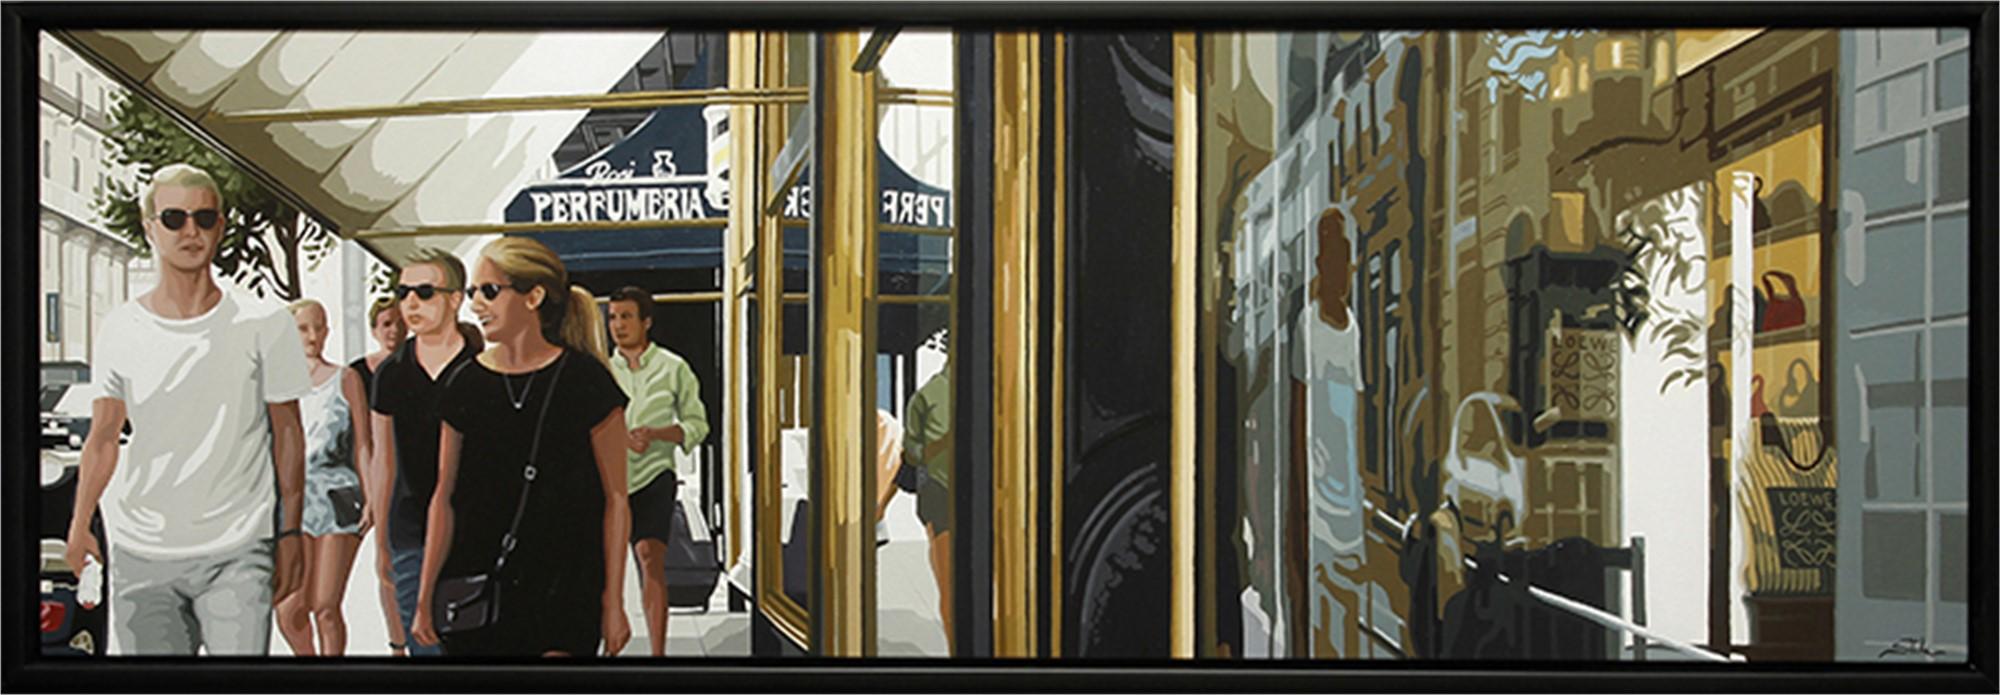 Urban Lifestyle by Rosana Sitcha